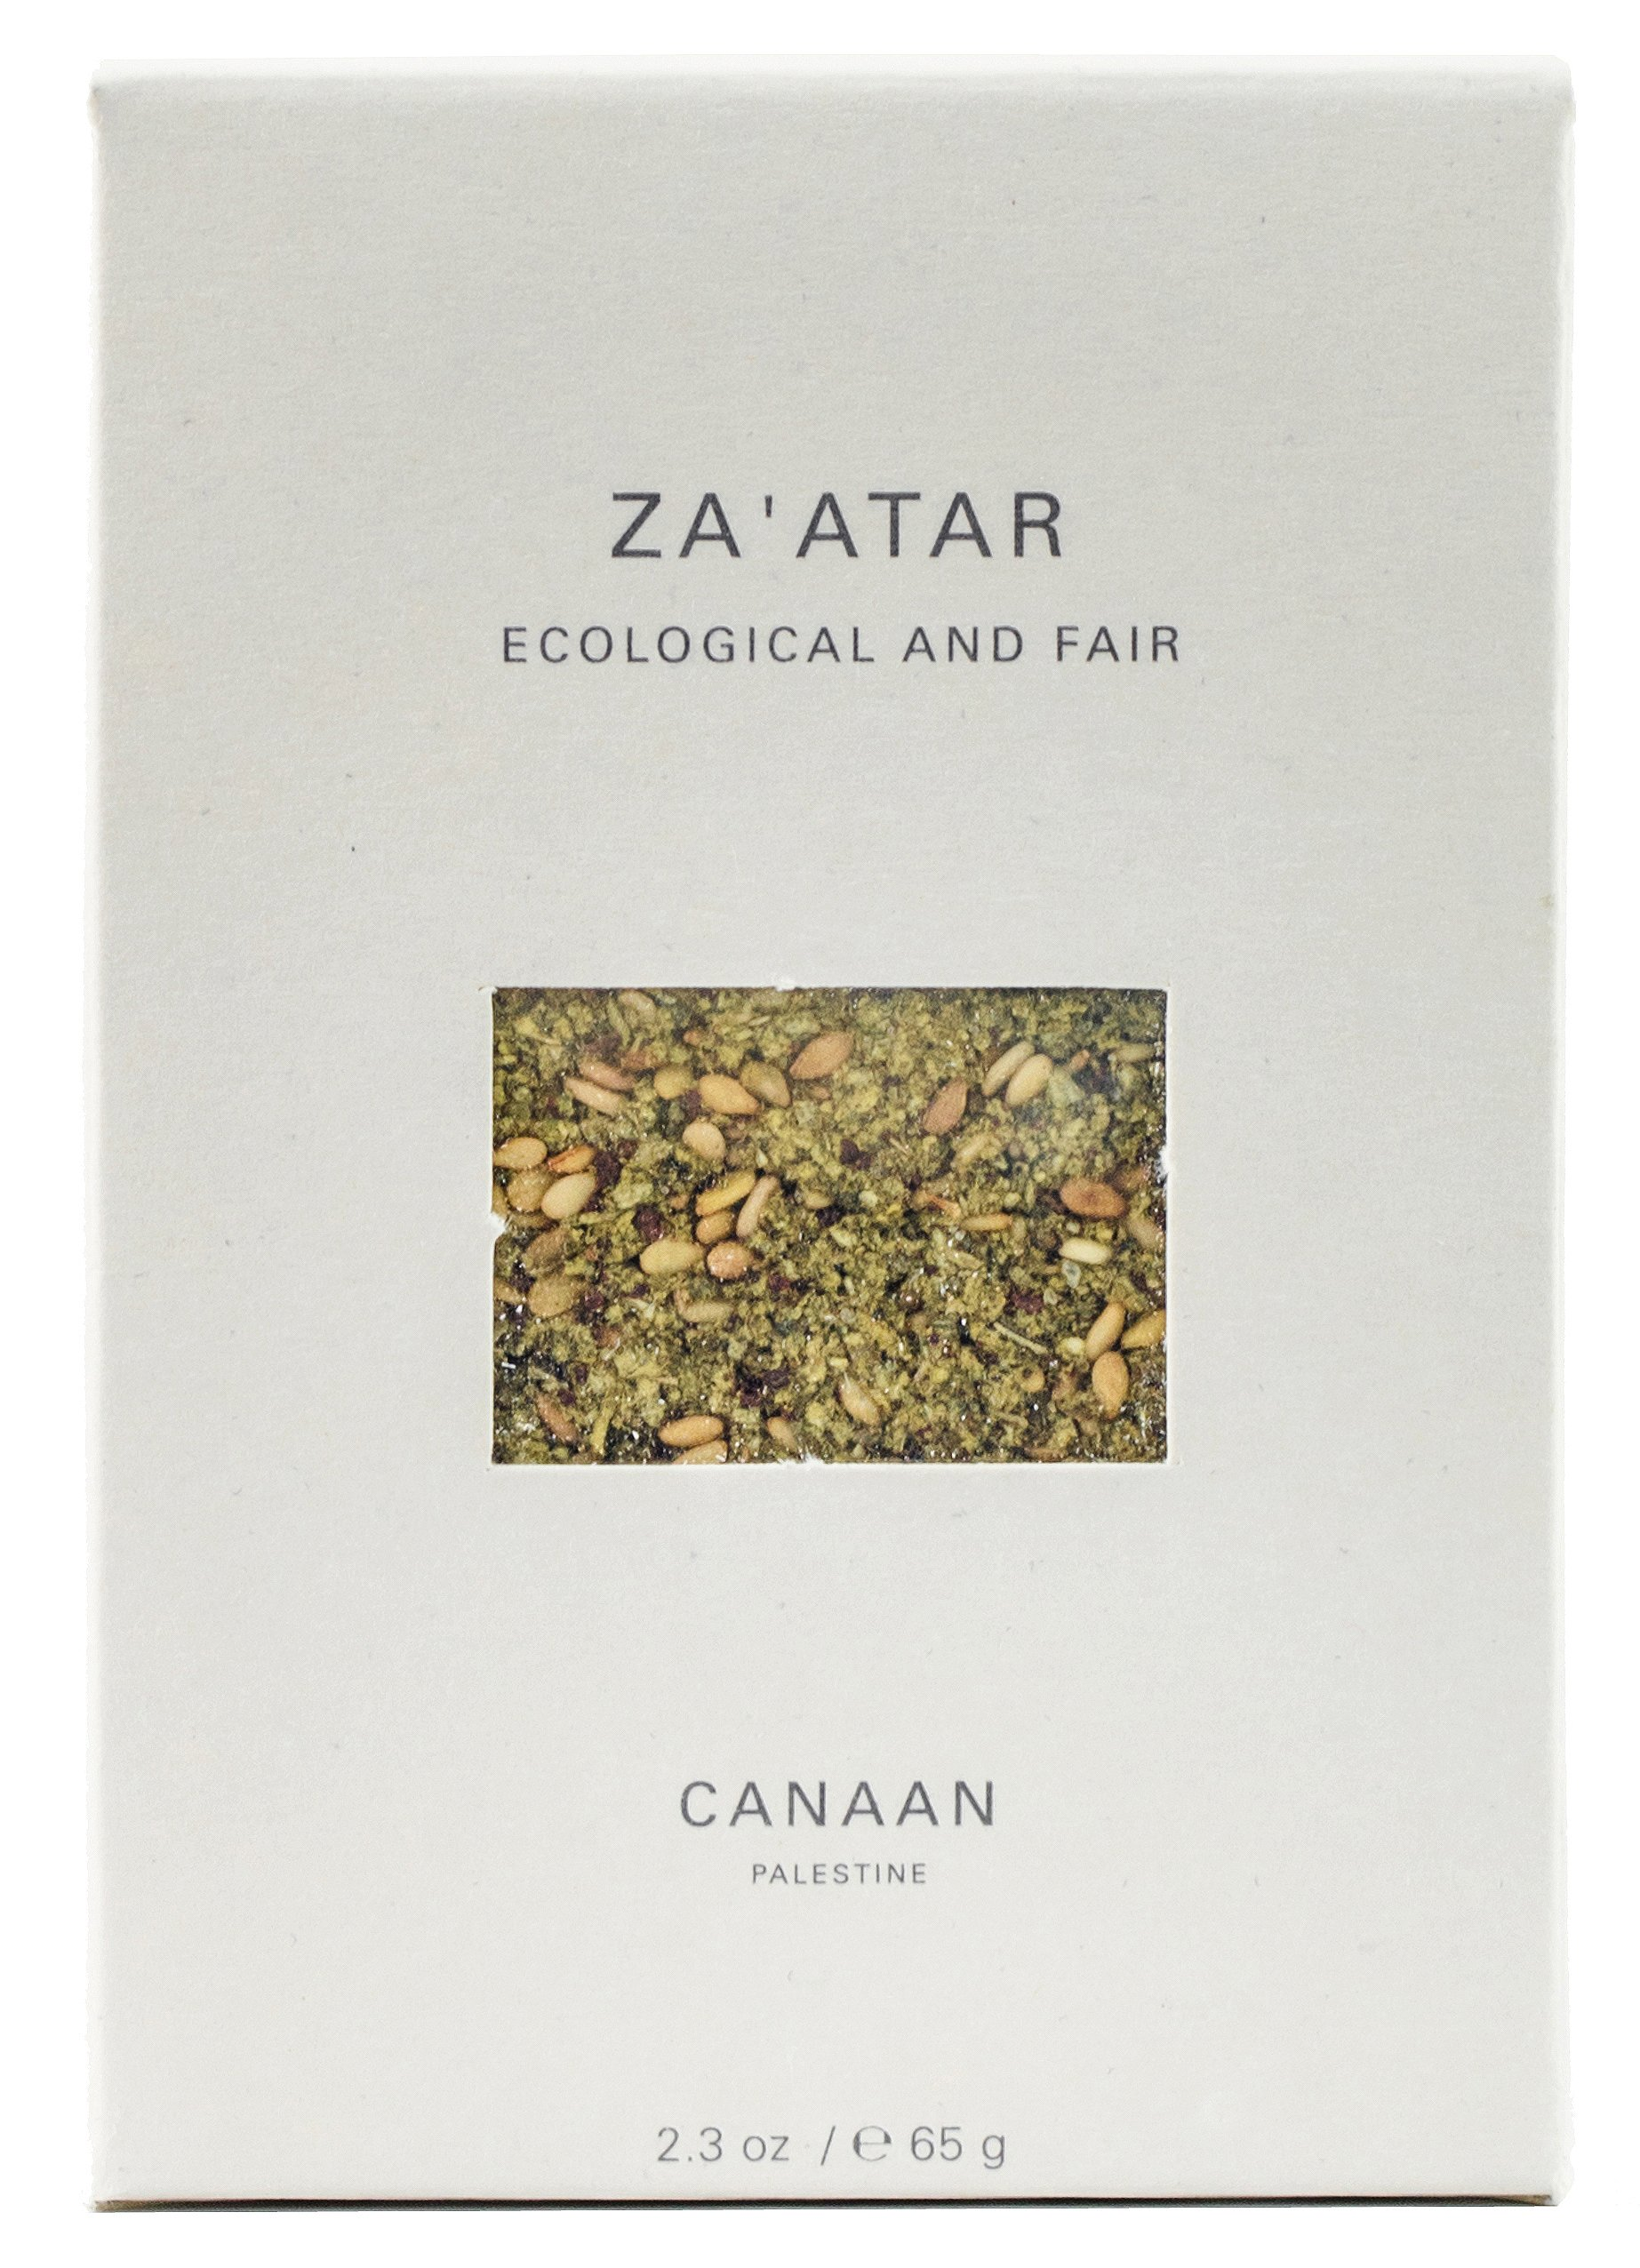 Canaan Zaatar (Zahtar, Zatar) Signature Spice Blend of Palestine, Fair Trade Certified, 65 gram (Pack of 3) by Canaan